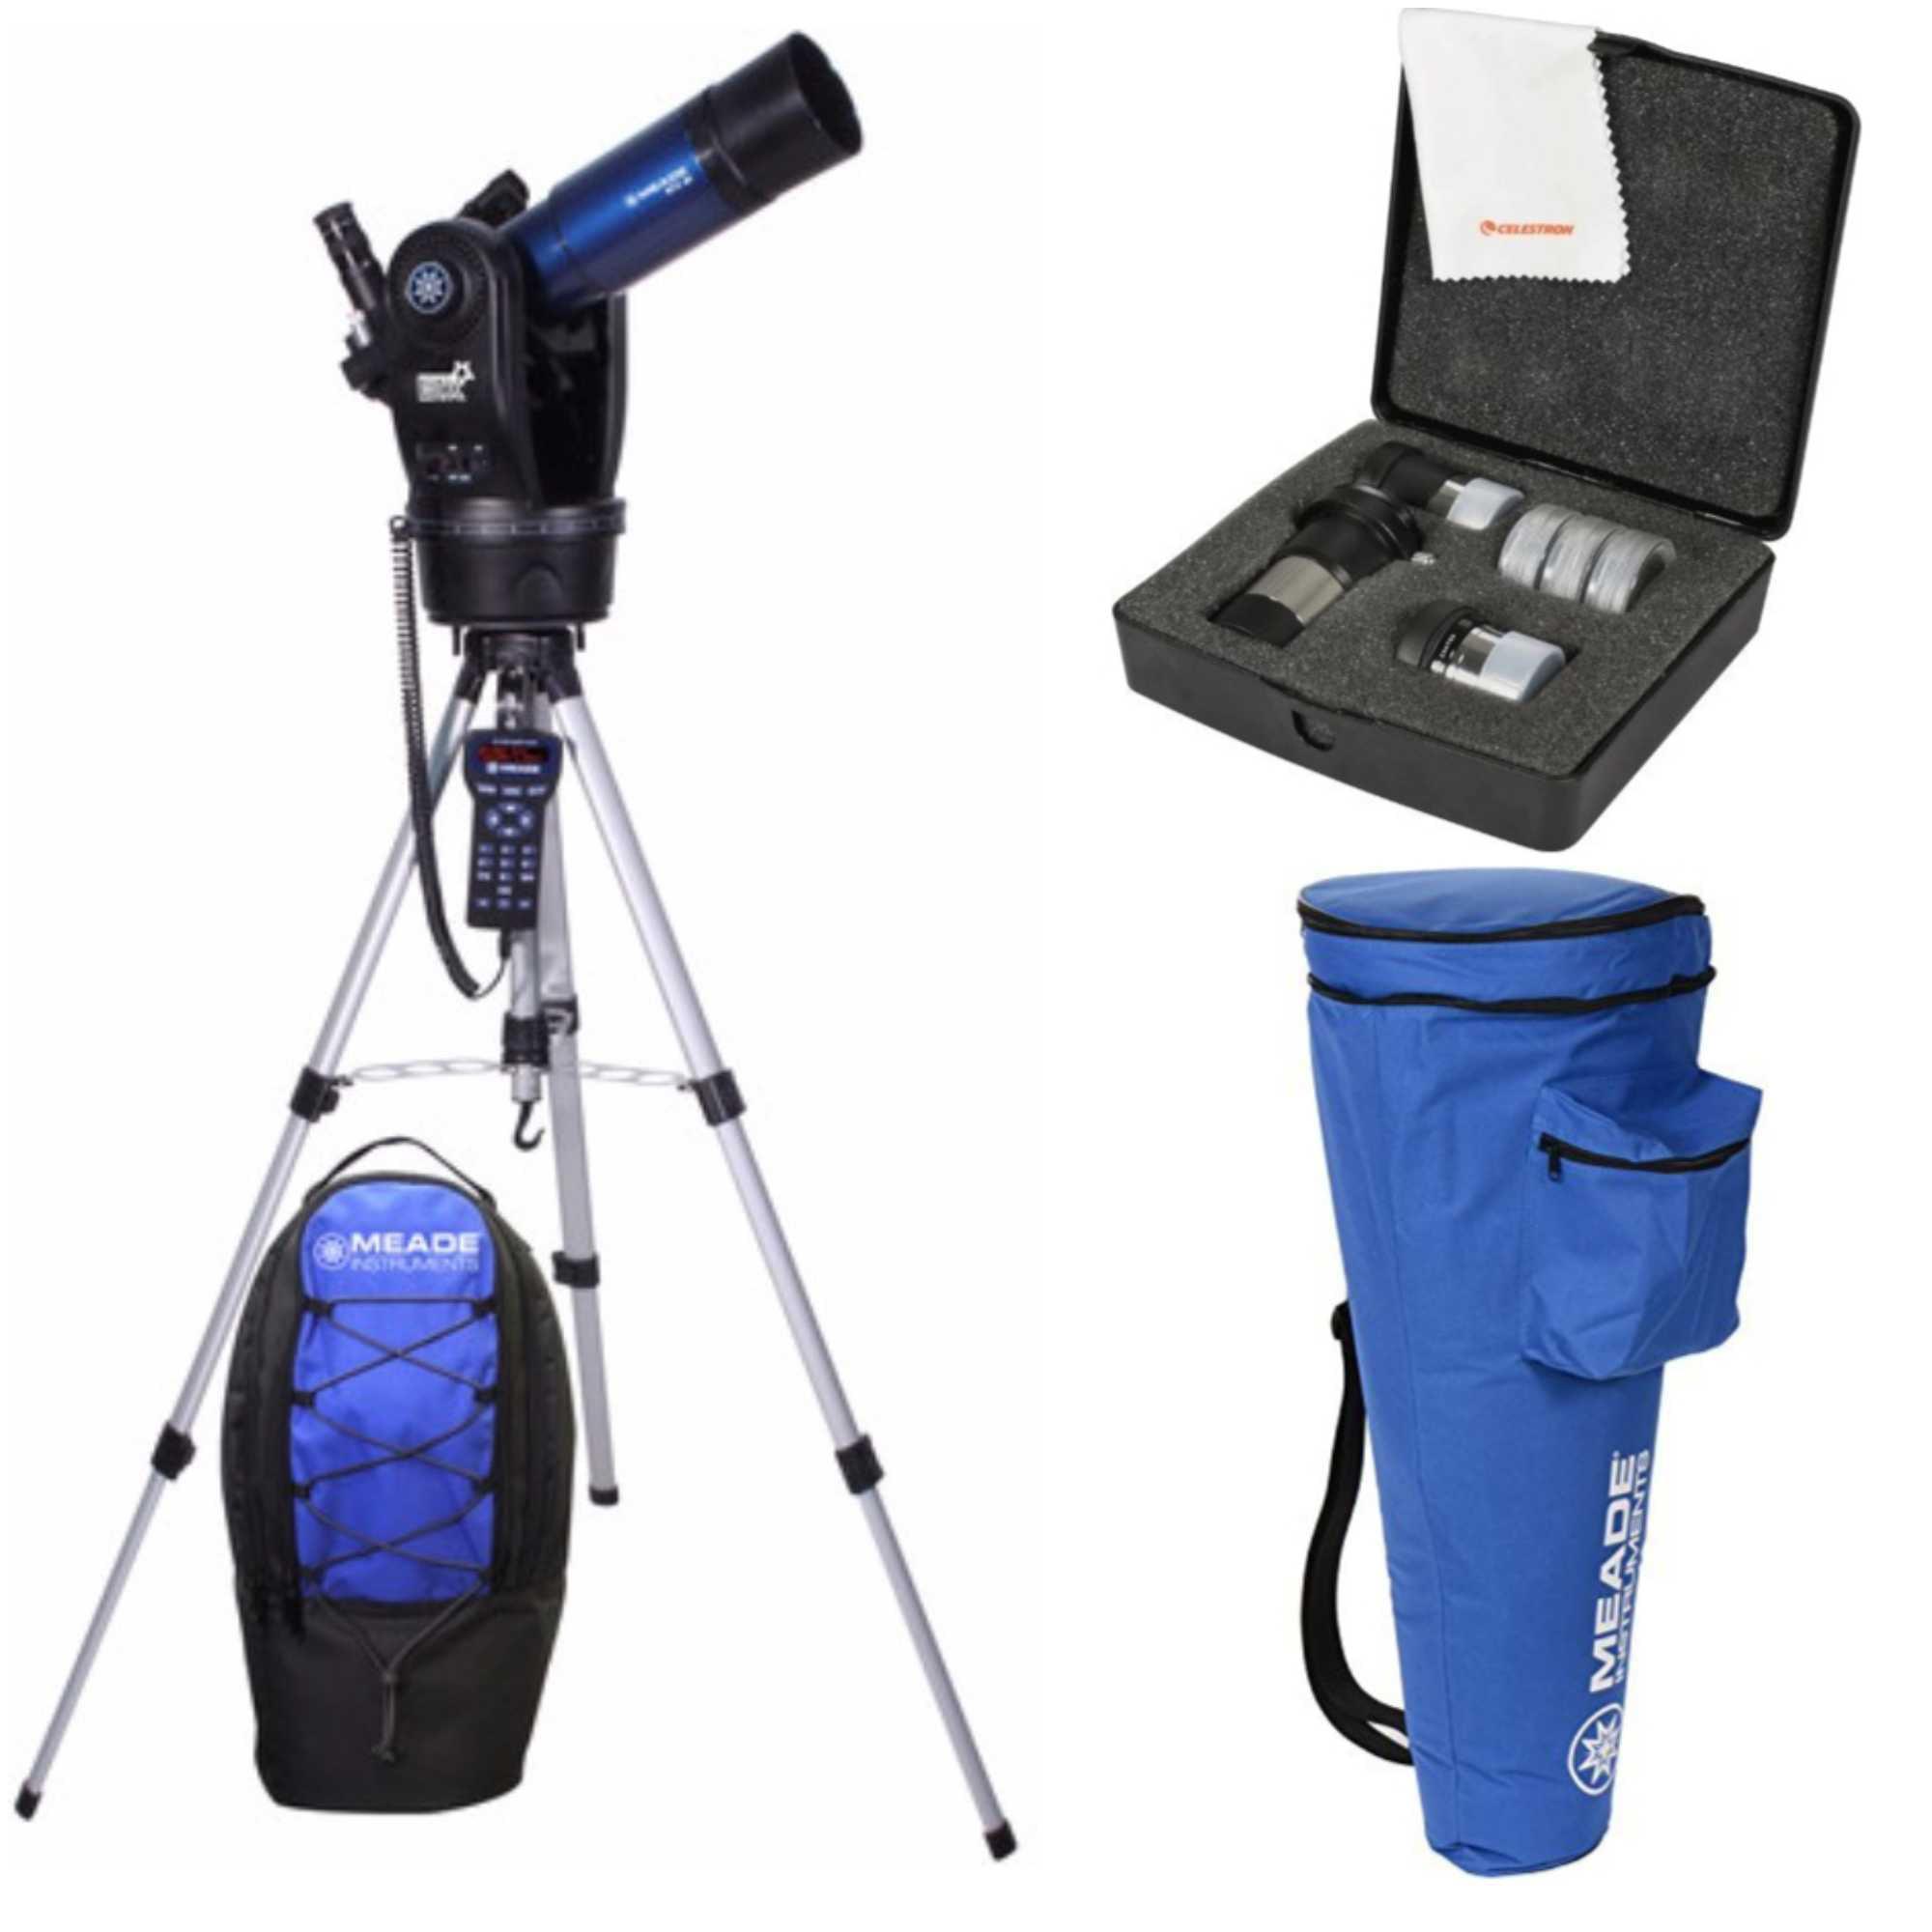 Meade ETX 80 Observer Telescope & Tripod (205002) W/Astromaster Eyepieces Kit